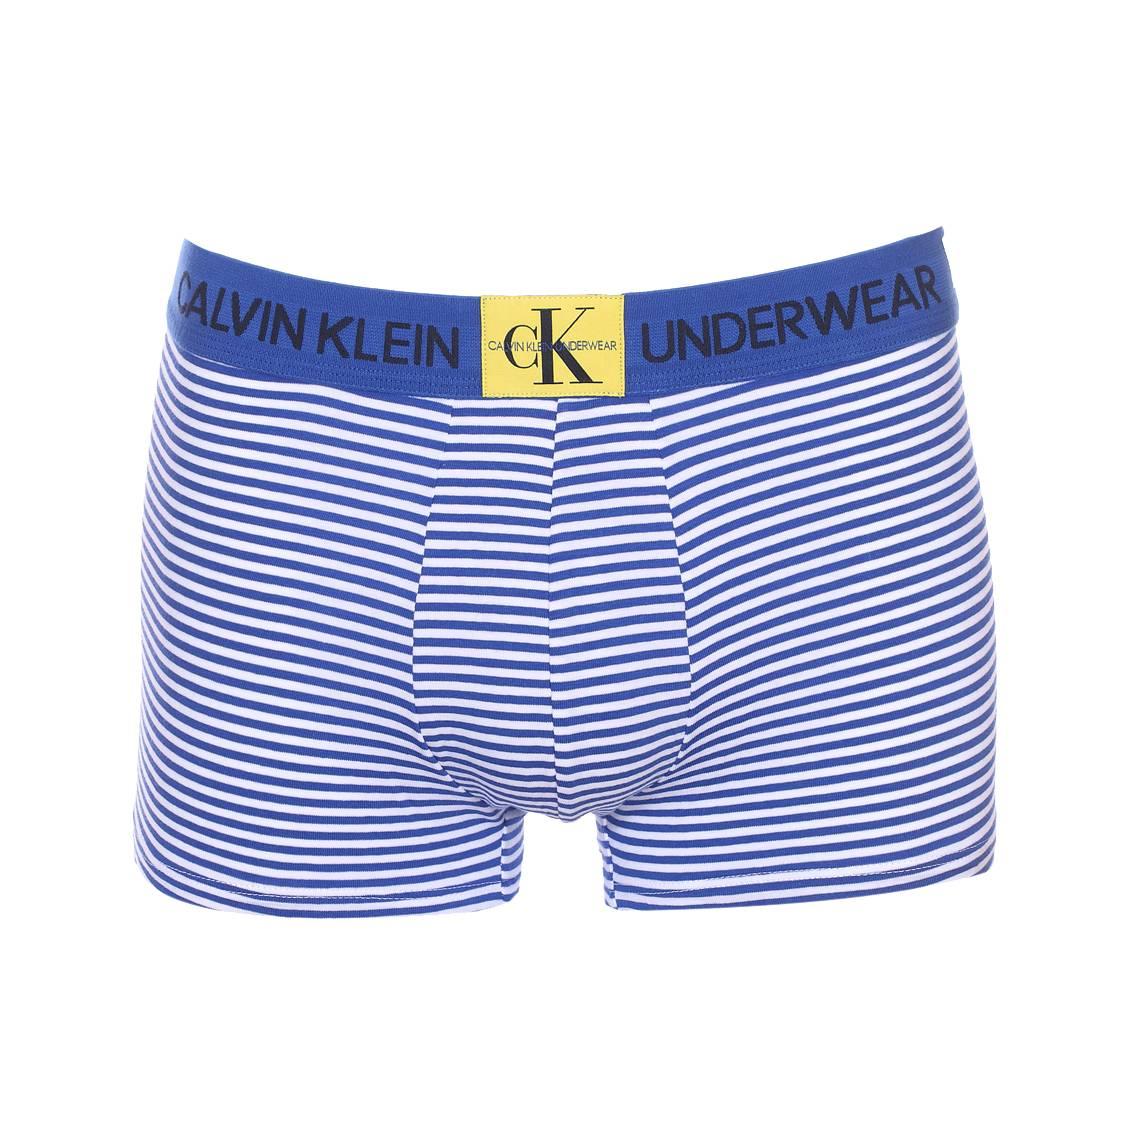 670d6d2d150 Boxer Calvin Klein Underwear en coton stretch bleu roi à rayures blanches  ...